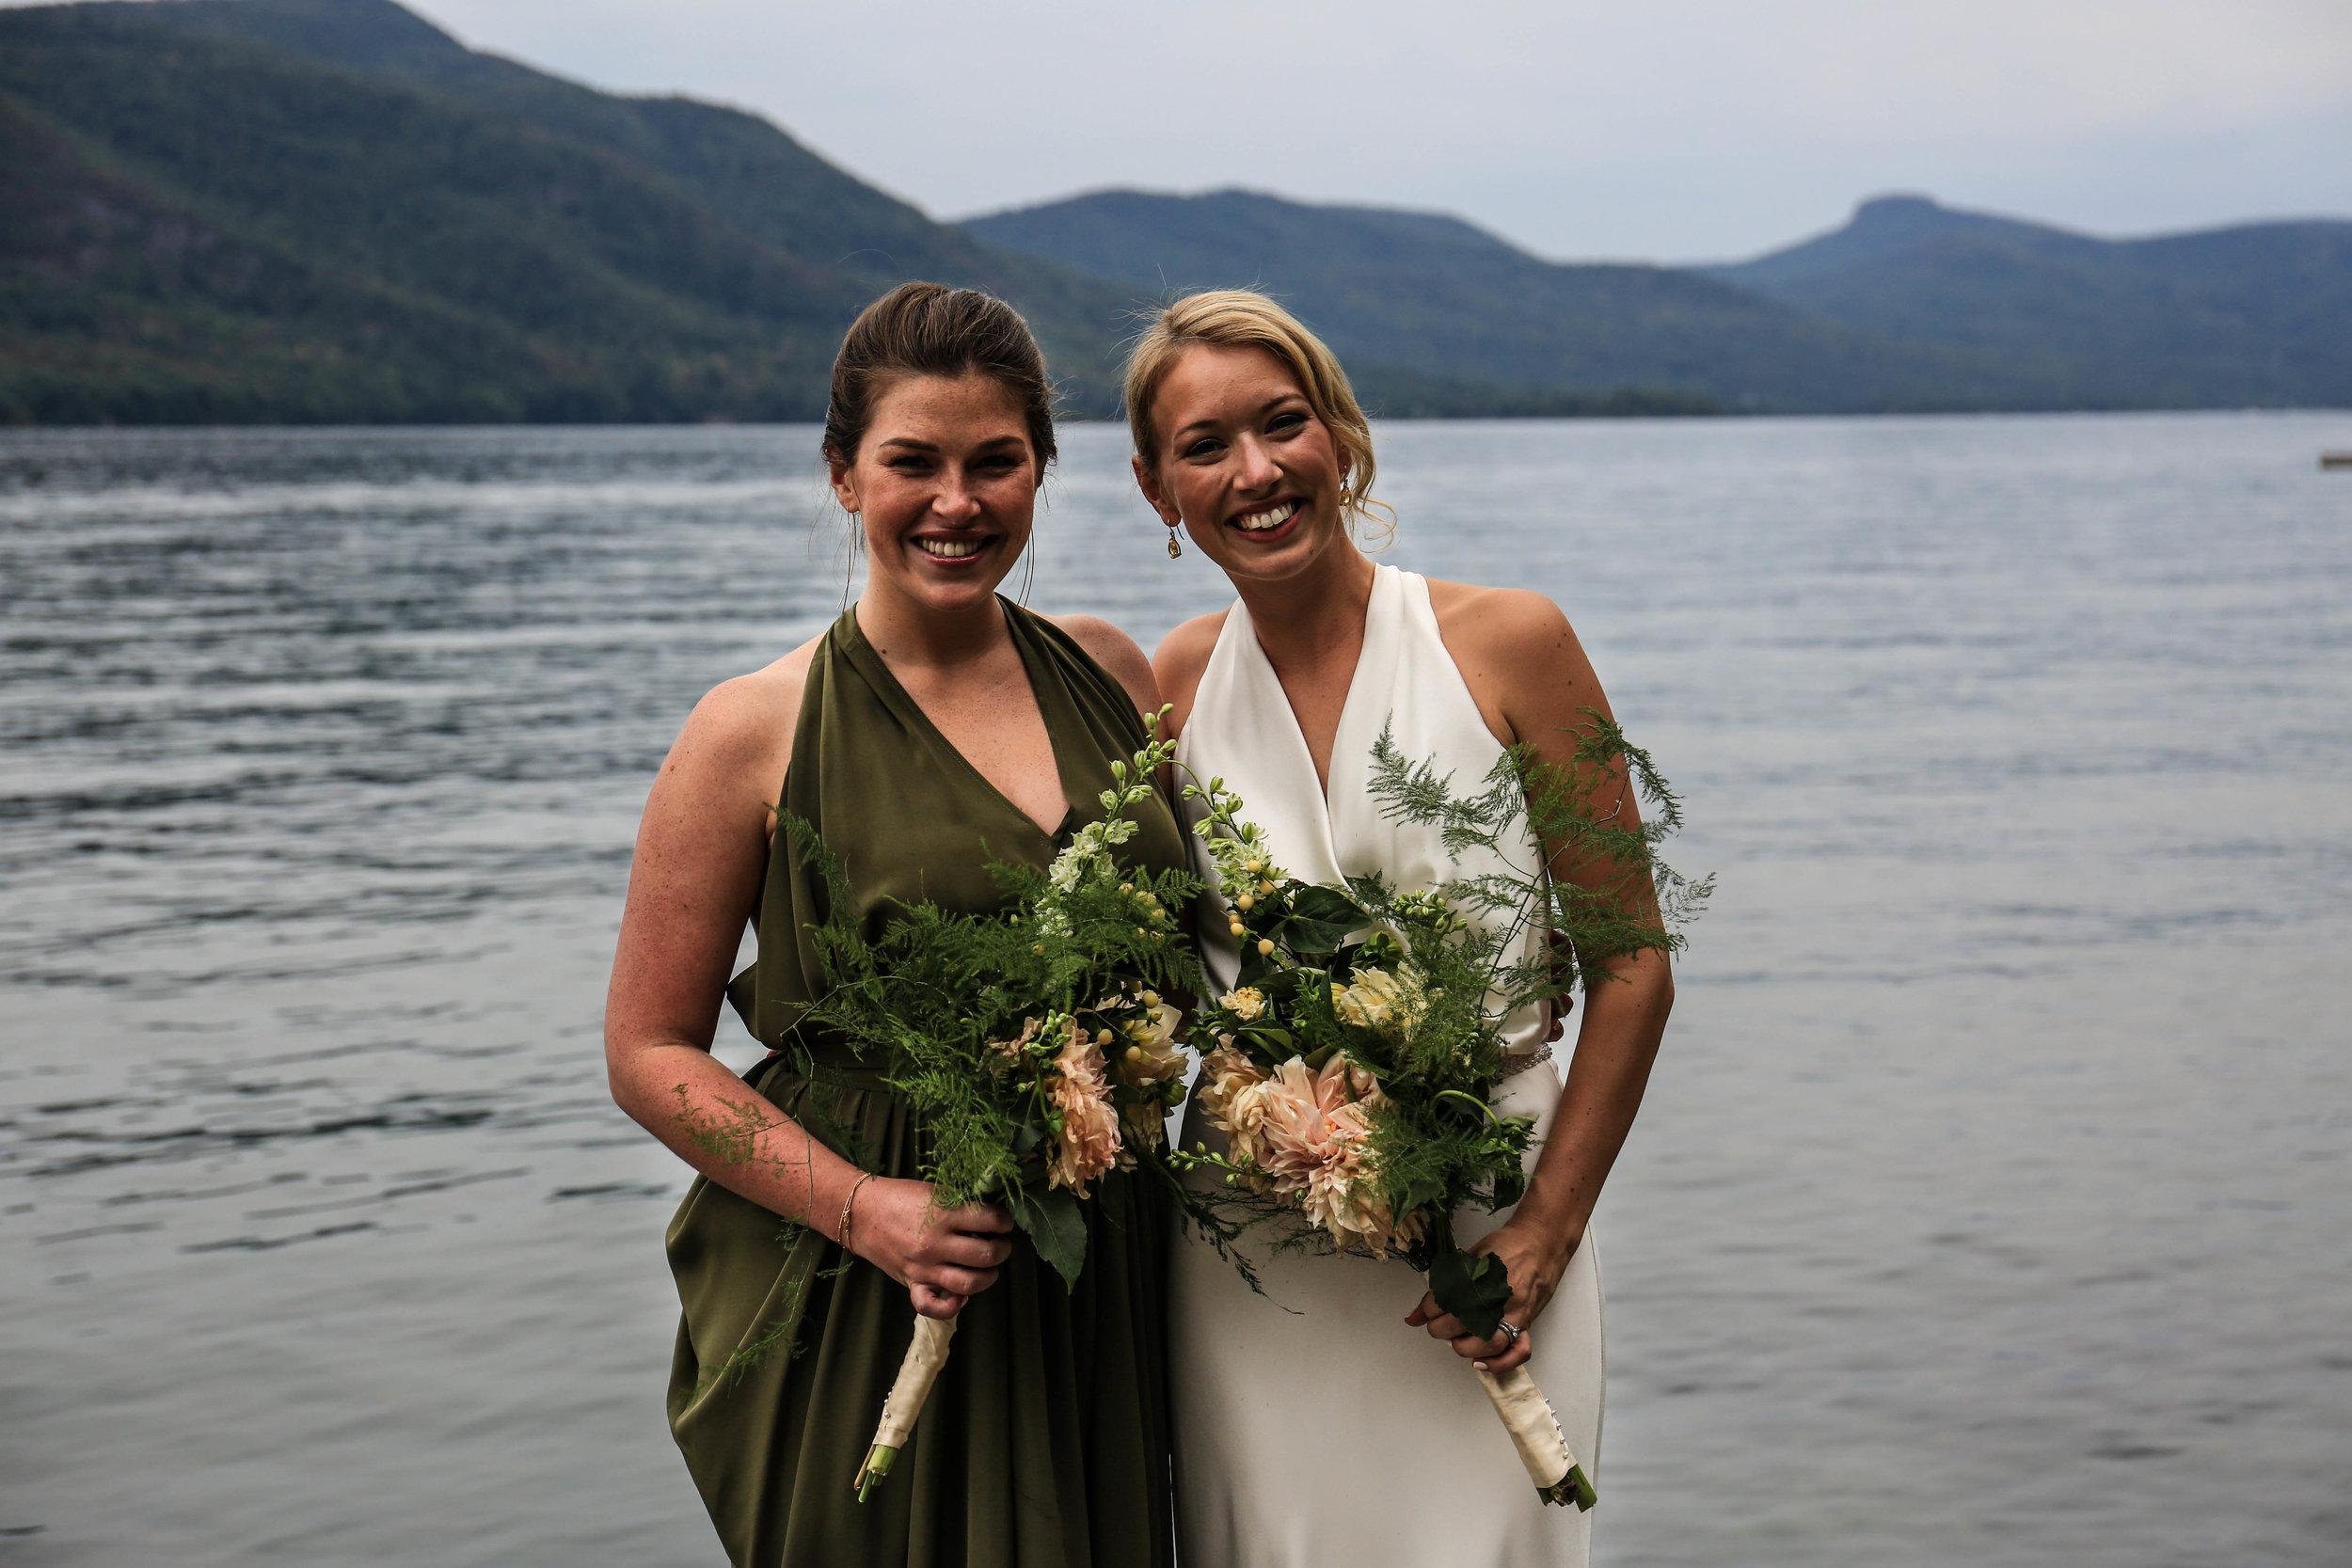 Ginn Wedding  Hague, Lake George, New York